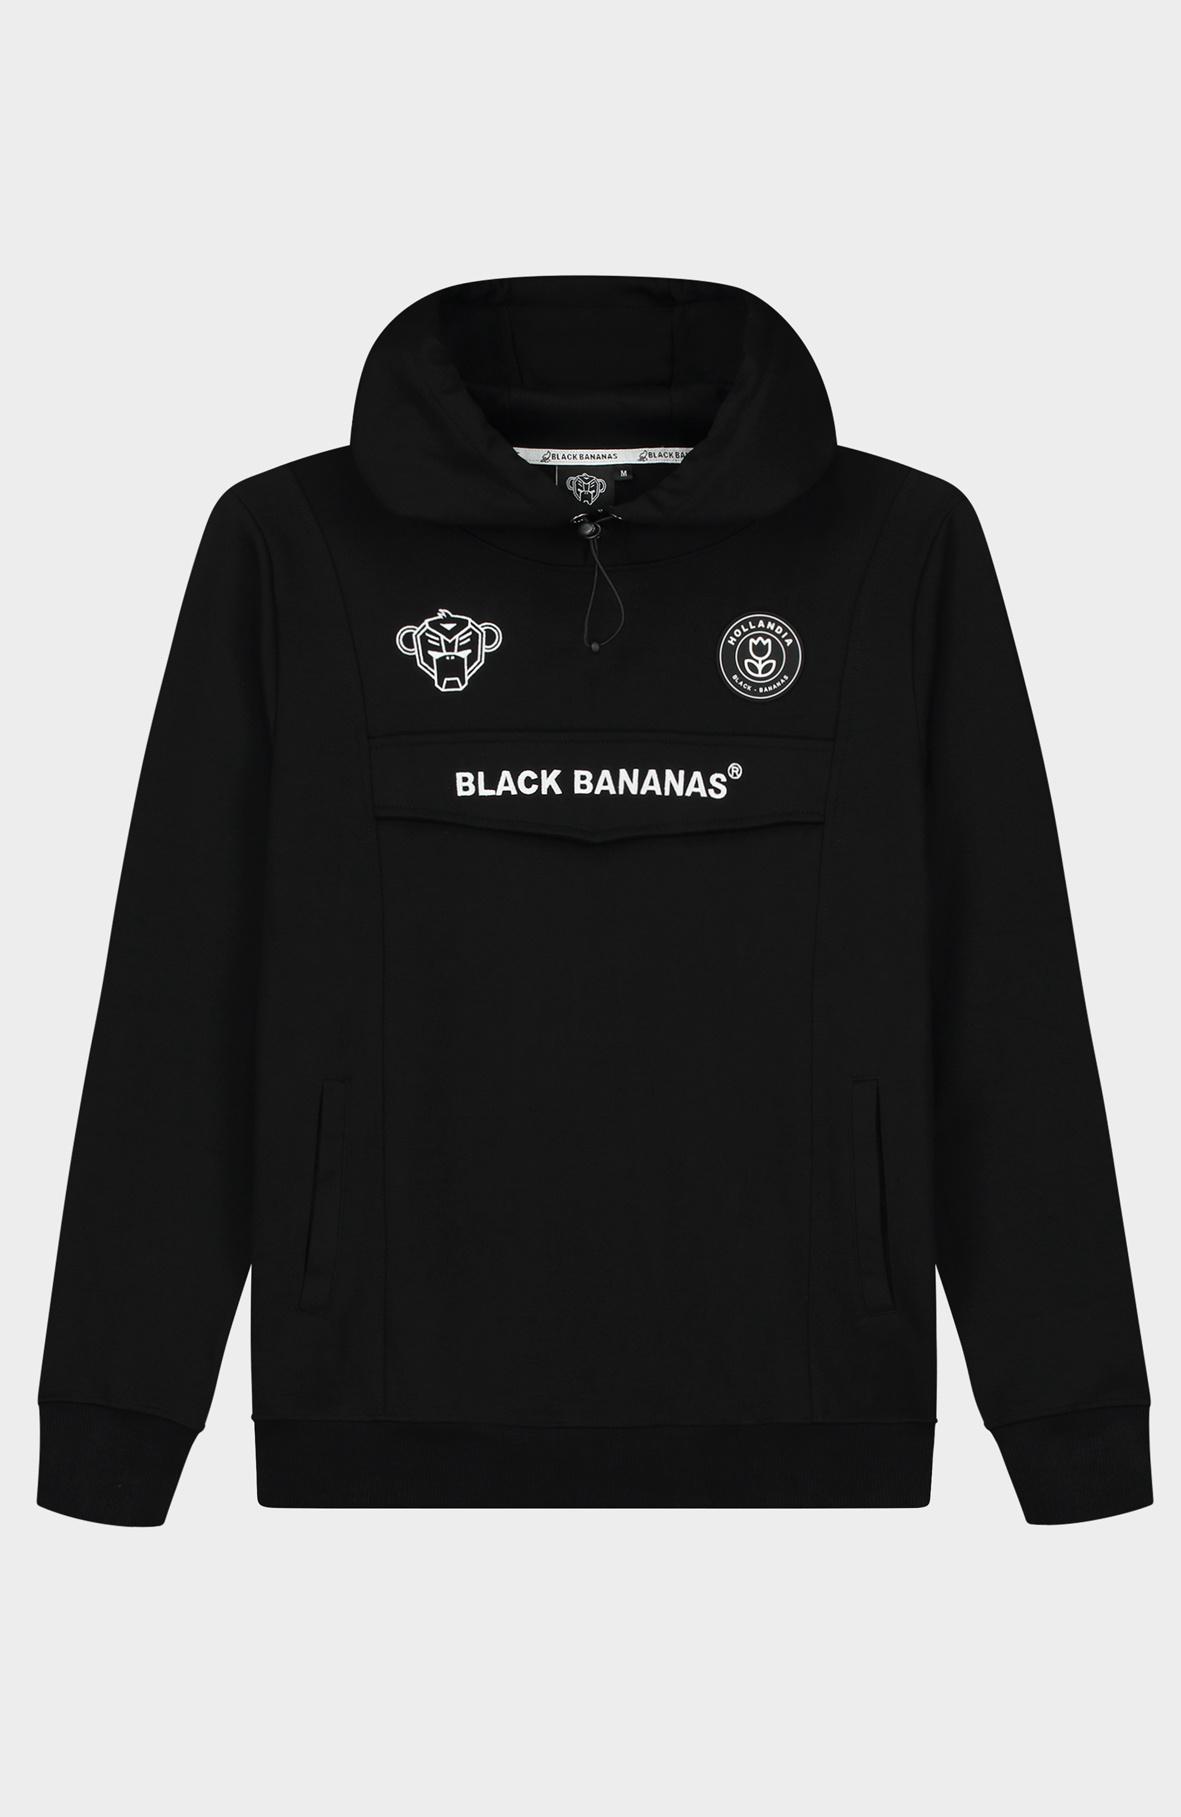 Black Bananas Black Bananas Anorak Tracksuit Serior Black